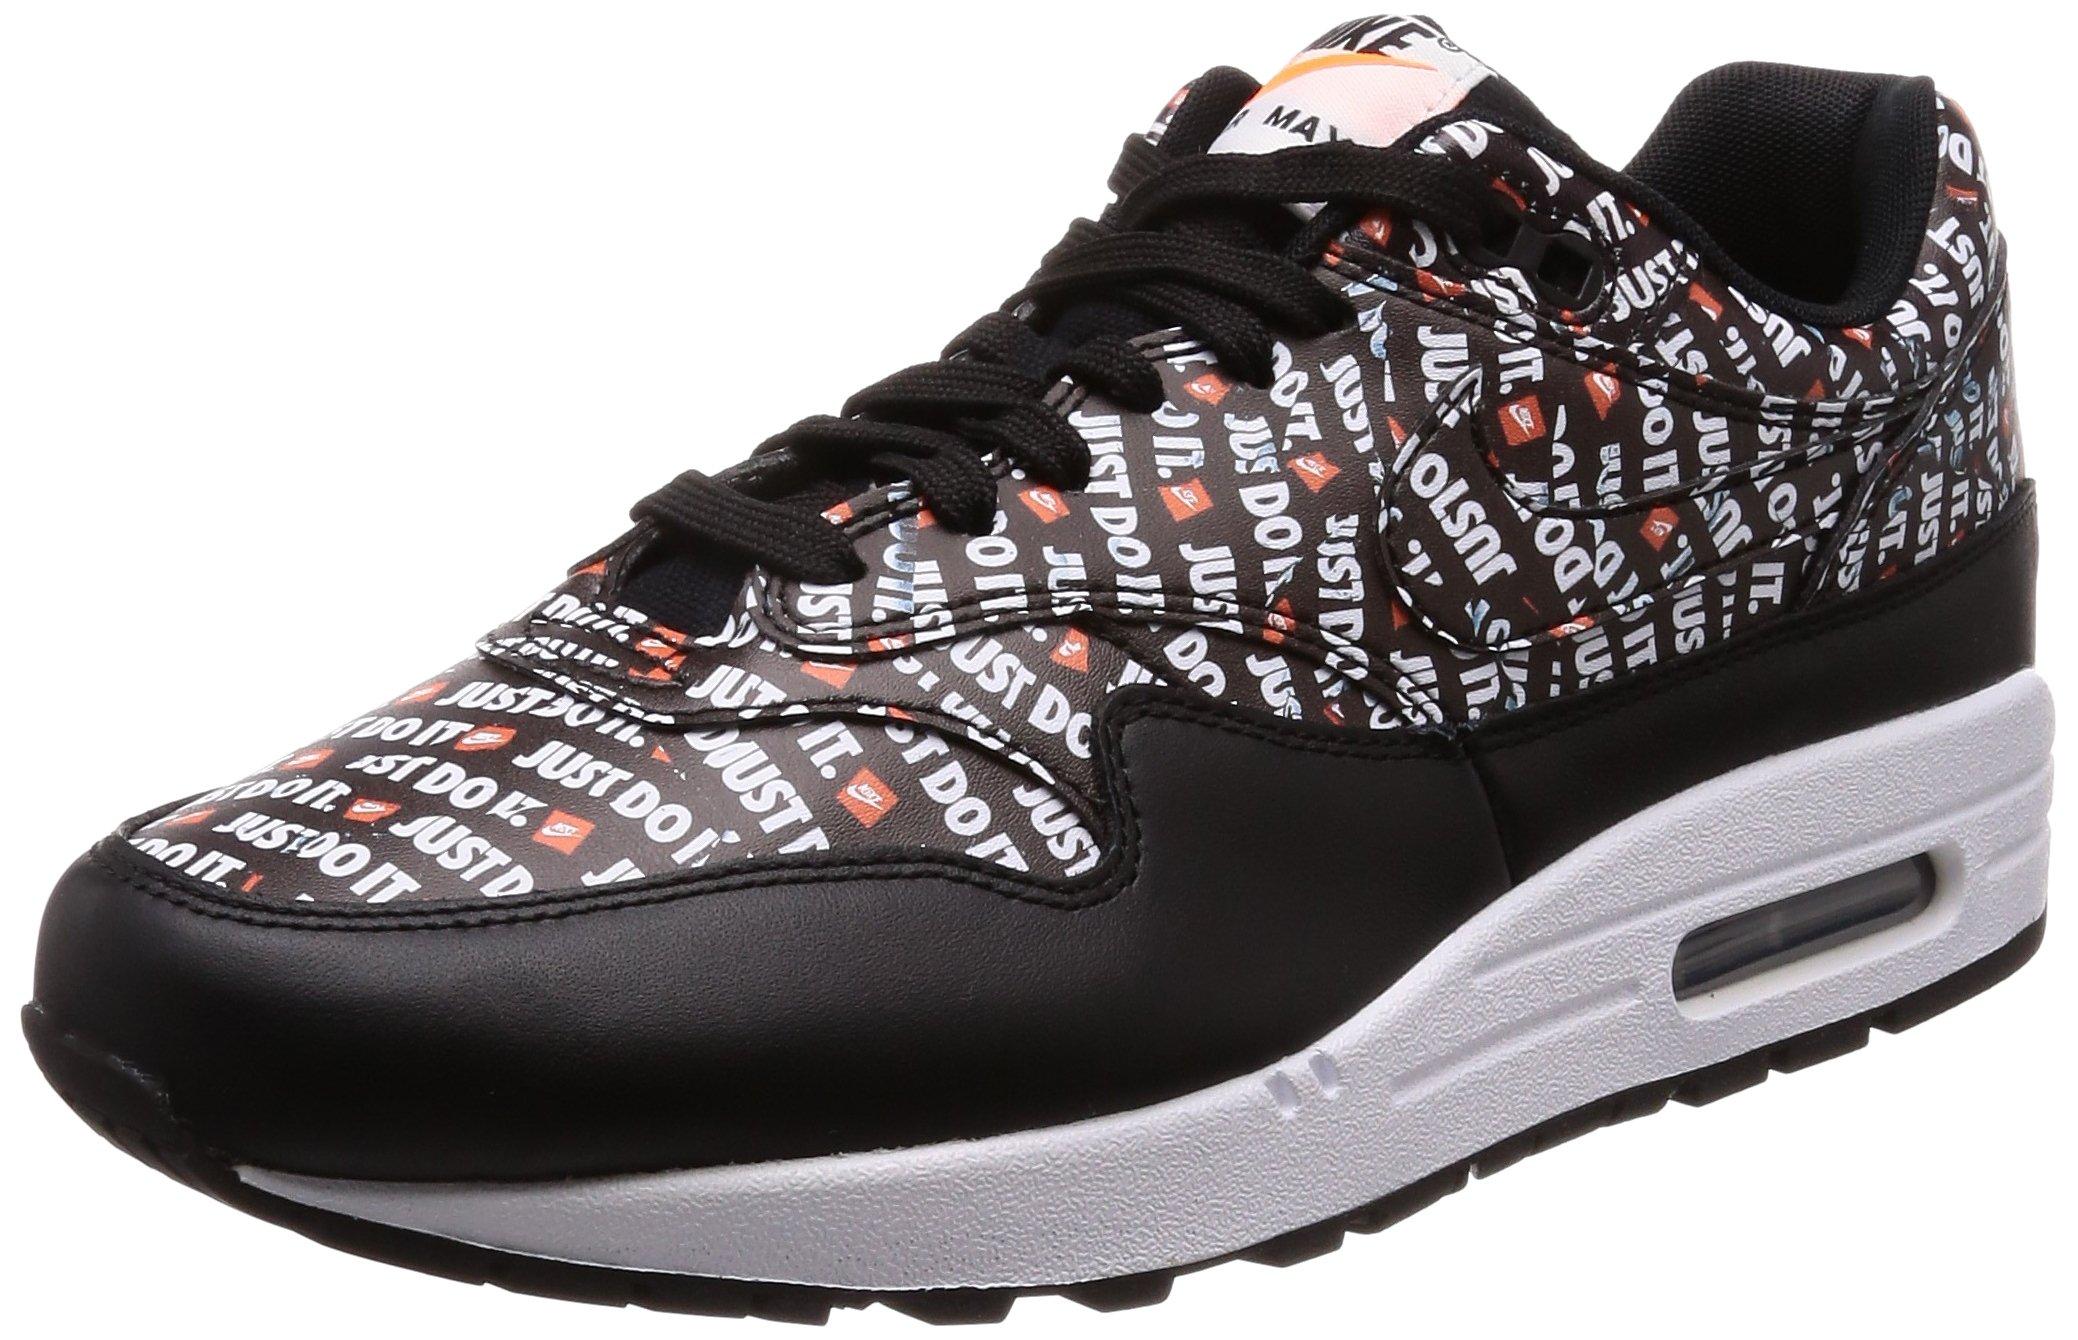 40f4b667c24ef Galleon - Nike Mens Air Max 1 Premium Fashion Sneaker (Just Do It ...